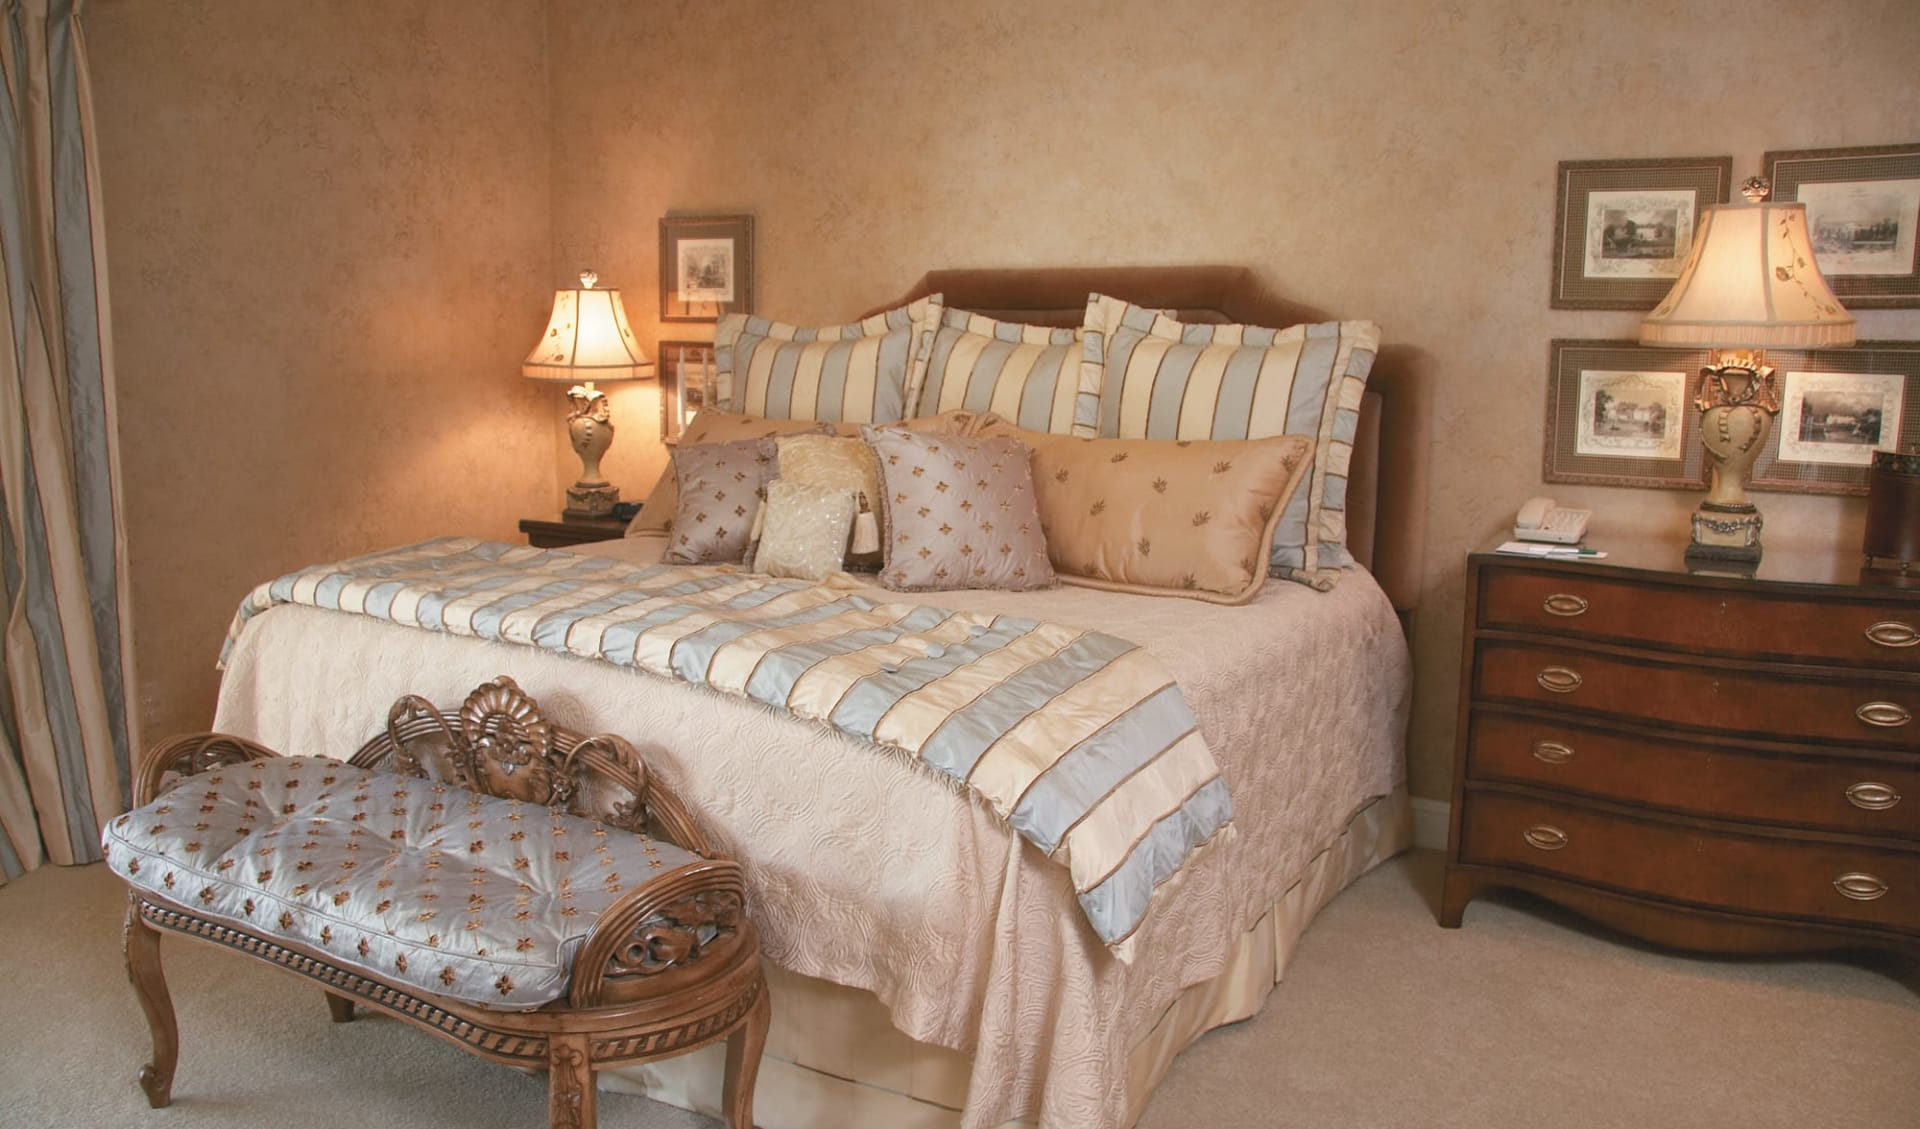 Salamander Spa & Golf Resort Innisbrook in Tampa:  Salamander Spa & Golf Resort Innsibrook - Penthouse Zimmer